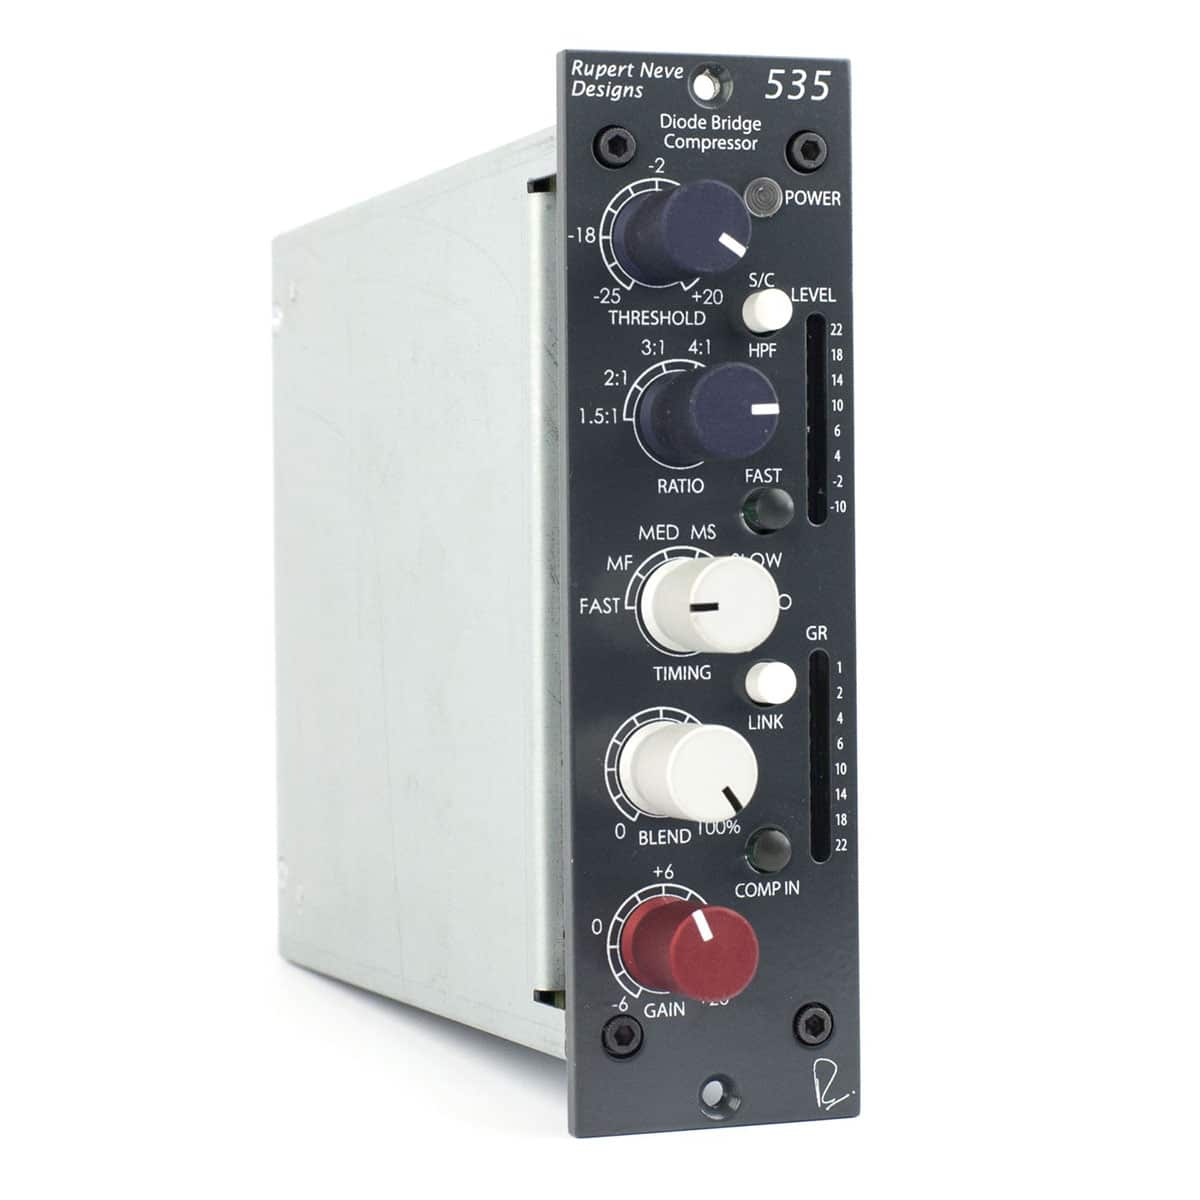 Rupert Neve 535 04 Pro Audio, Outboard, Compressori